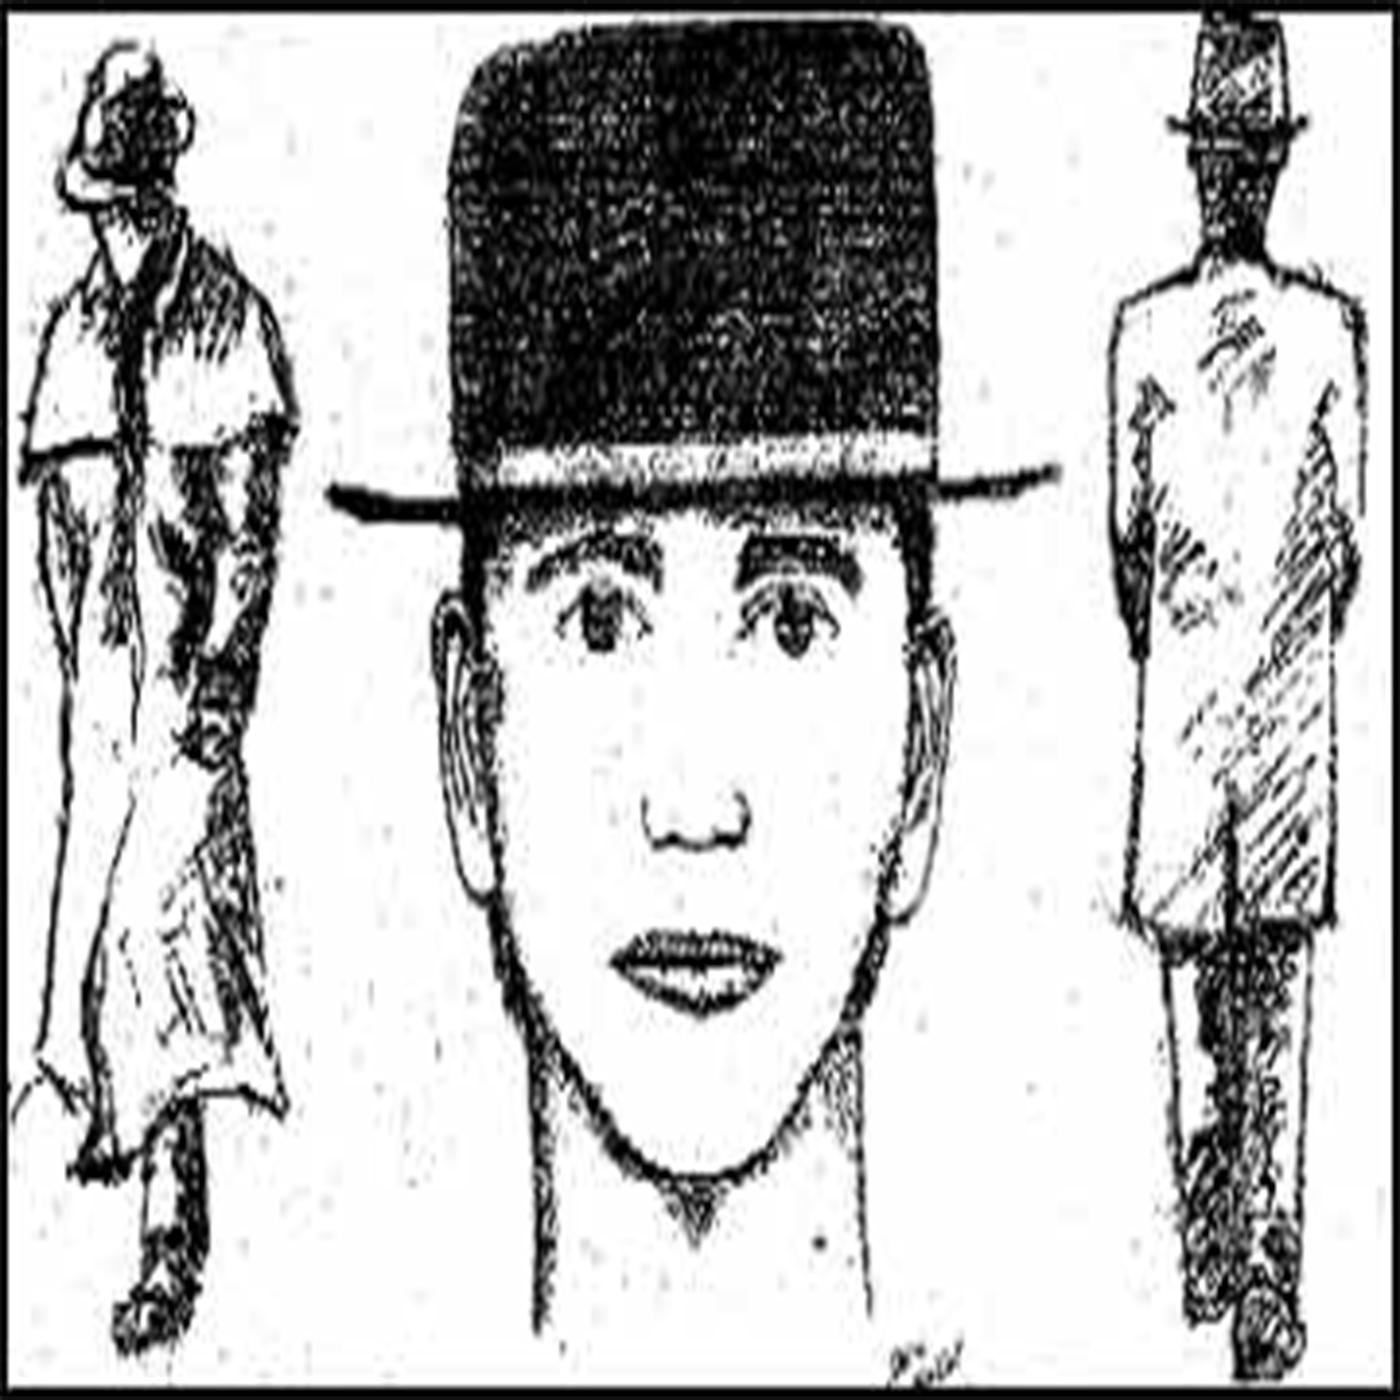 The Florence Salon Murders